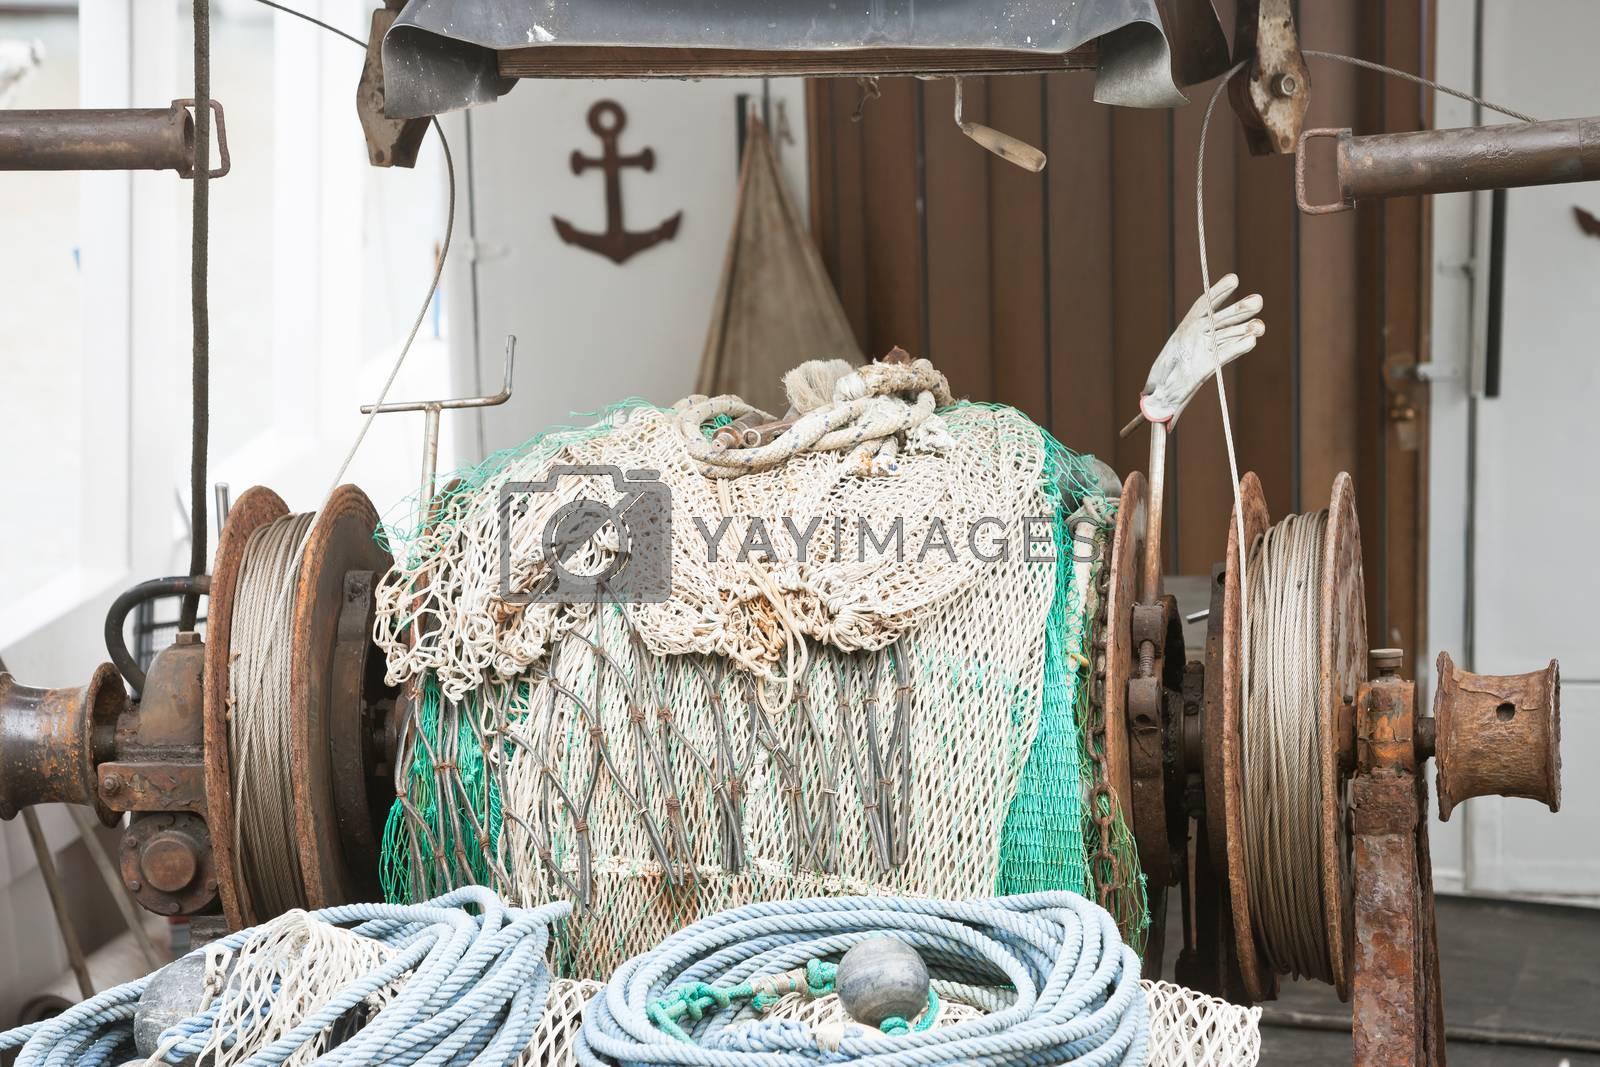 Novigrad, Istria, Croatia, Europe - An old fishing net winch on a fishing boat